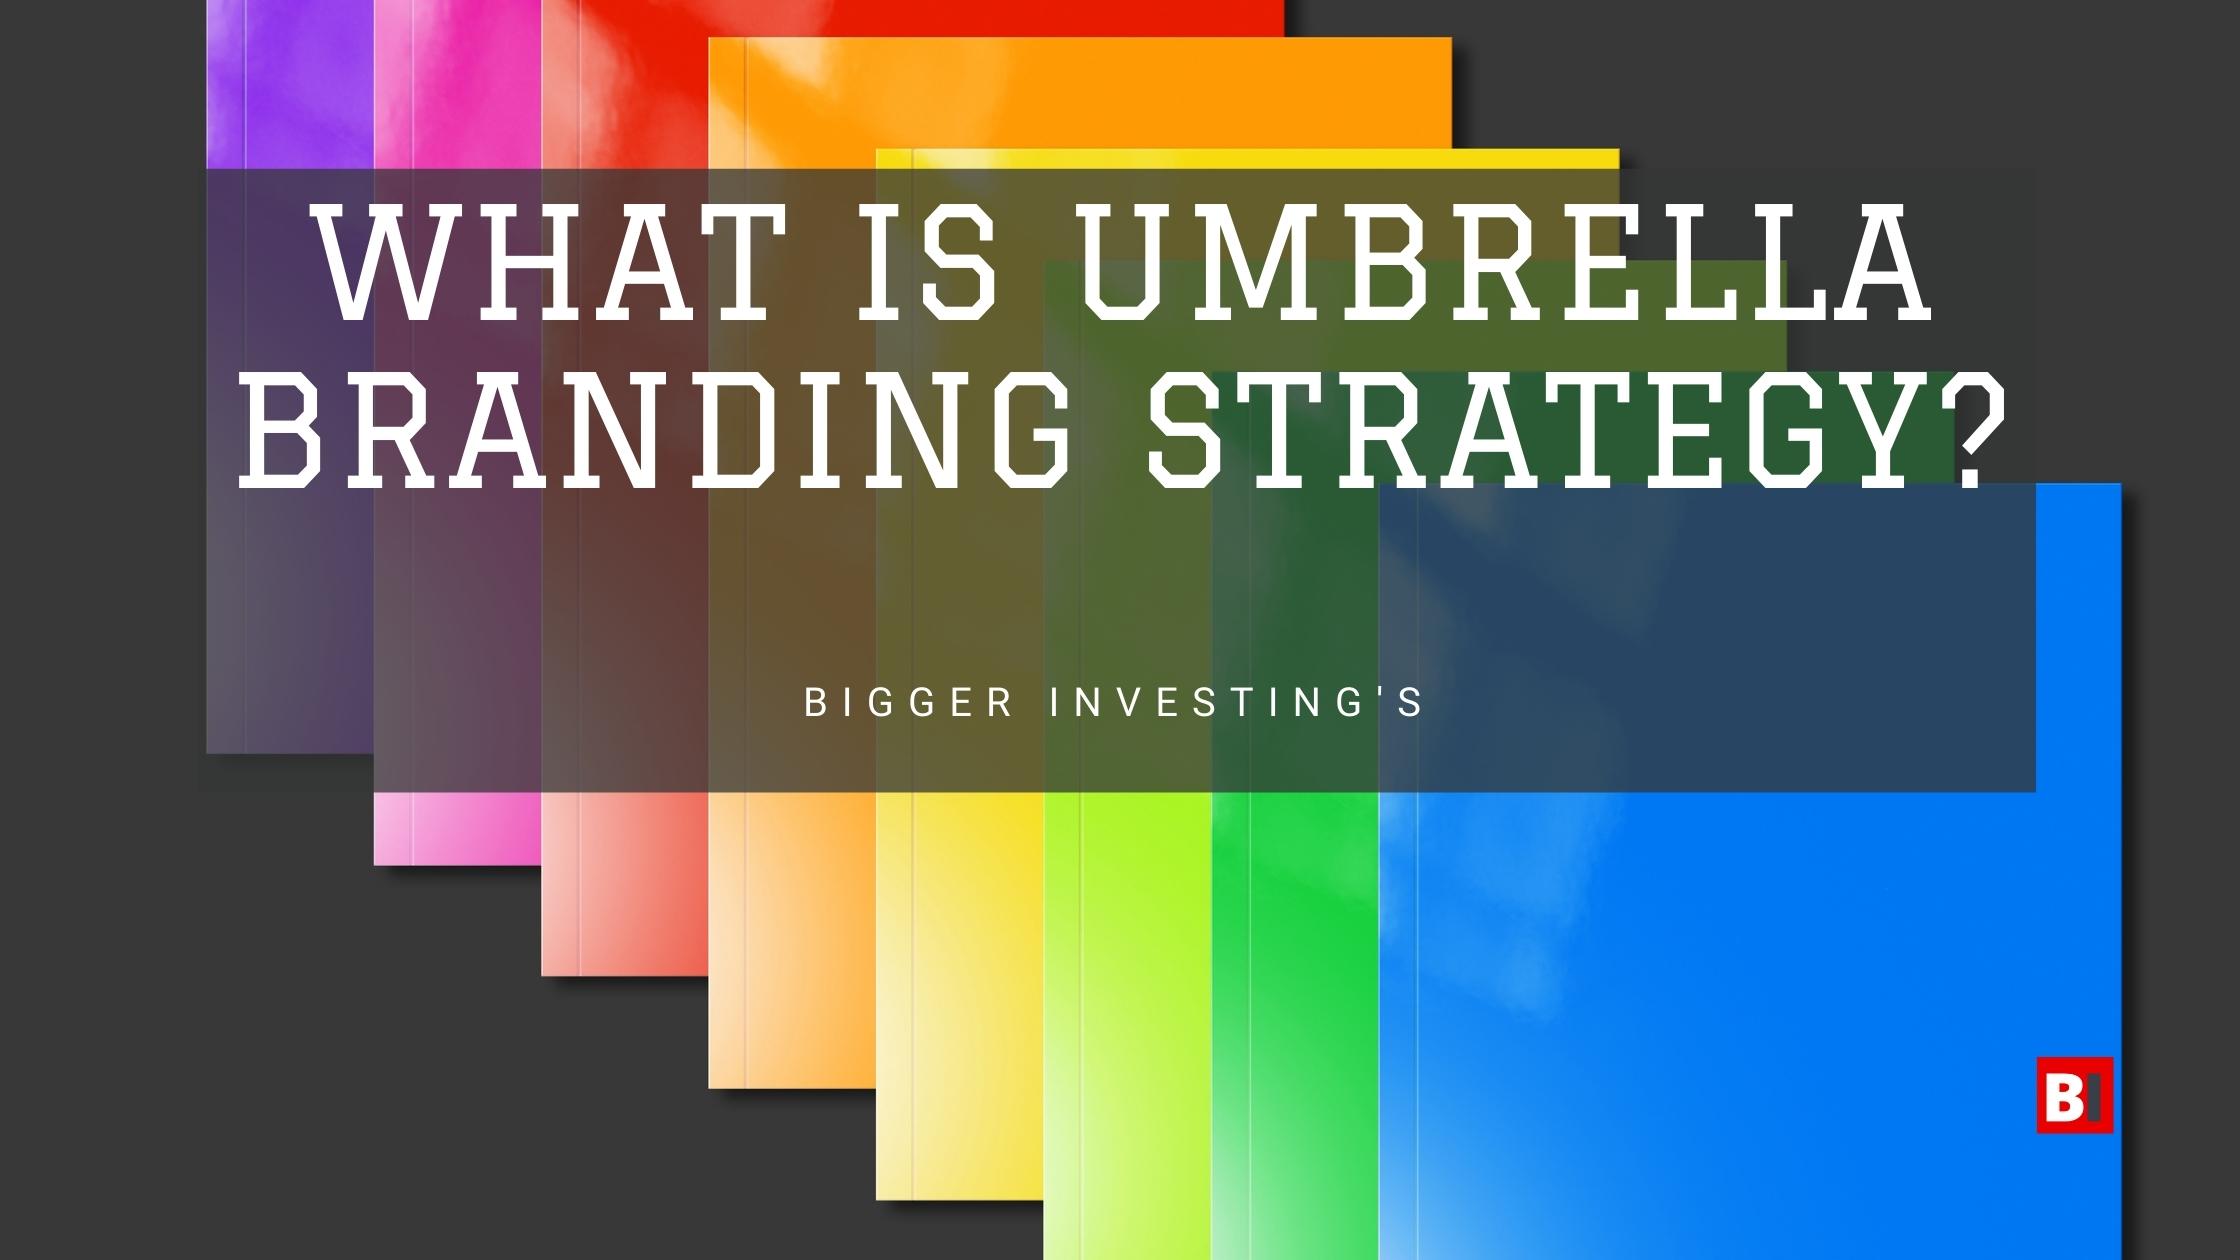 What is Umbrella Branding Strategy?